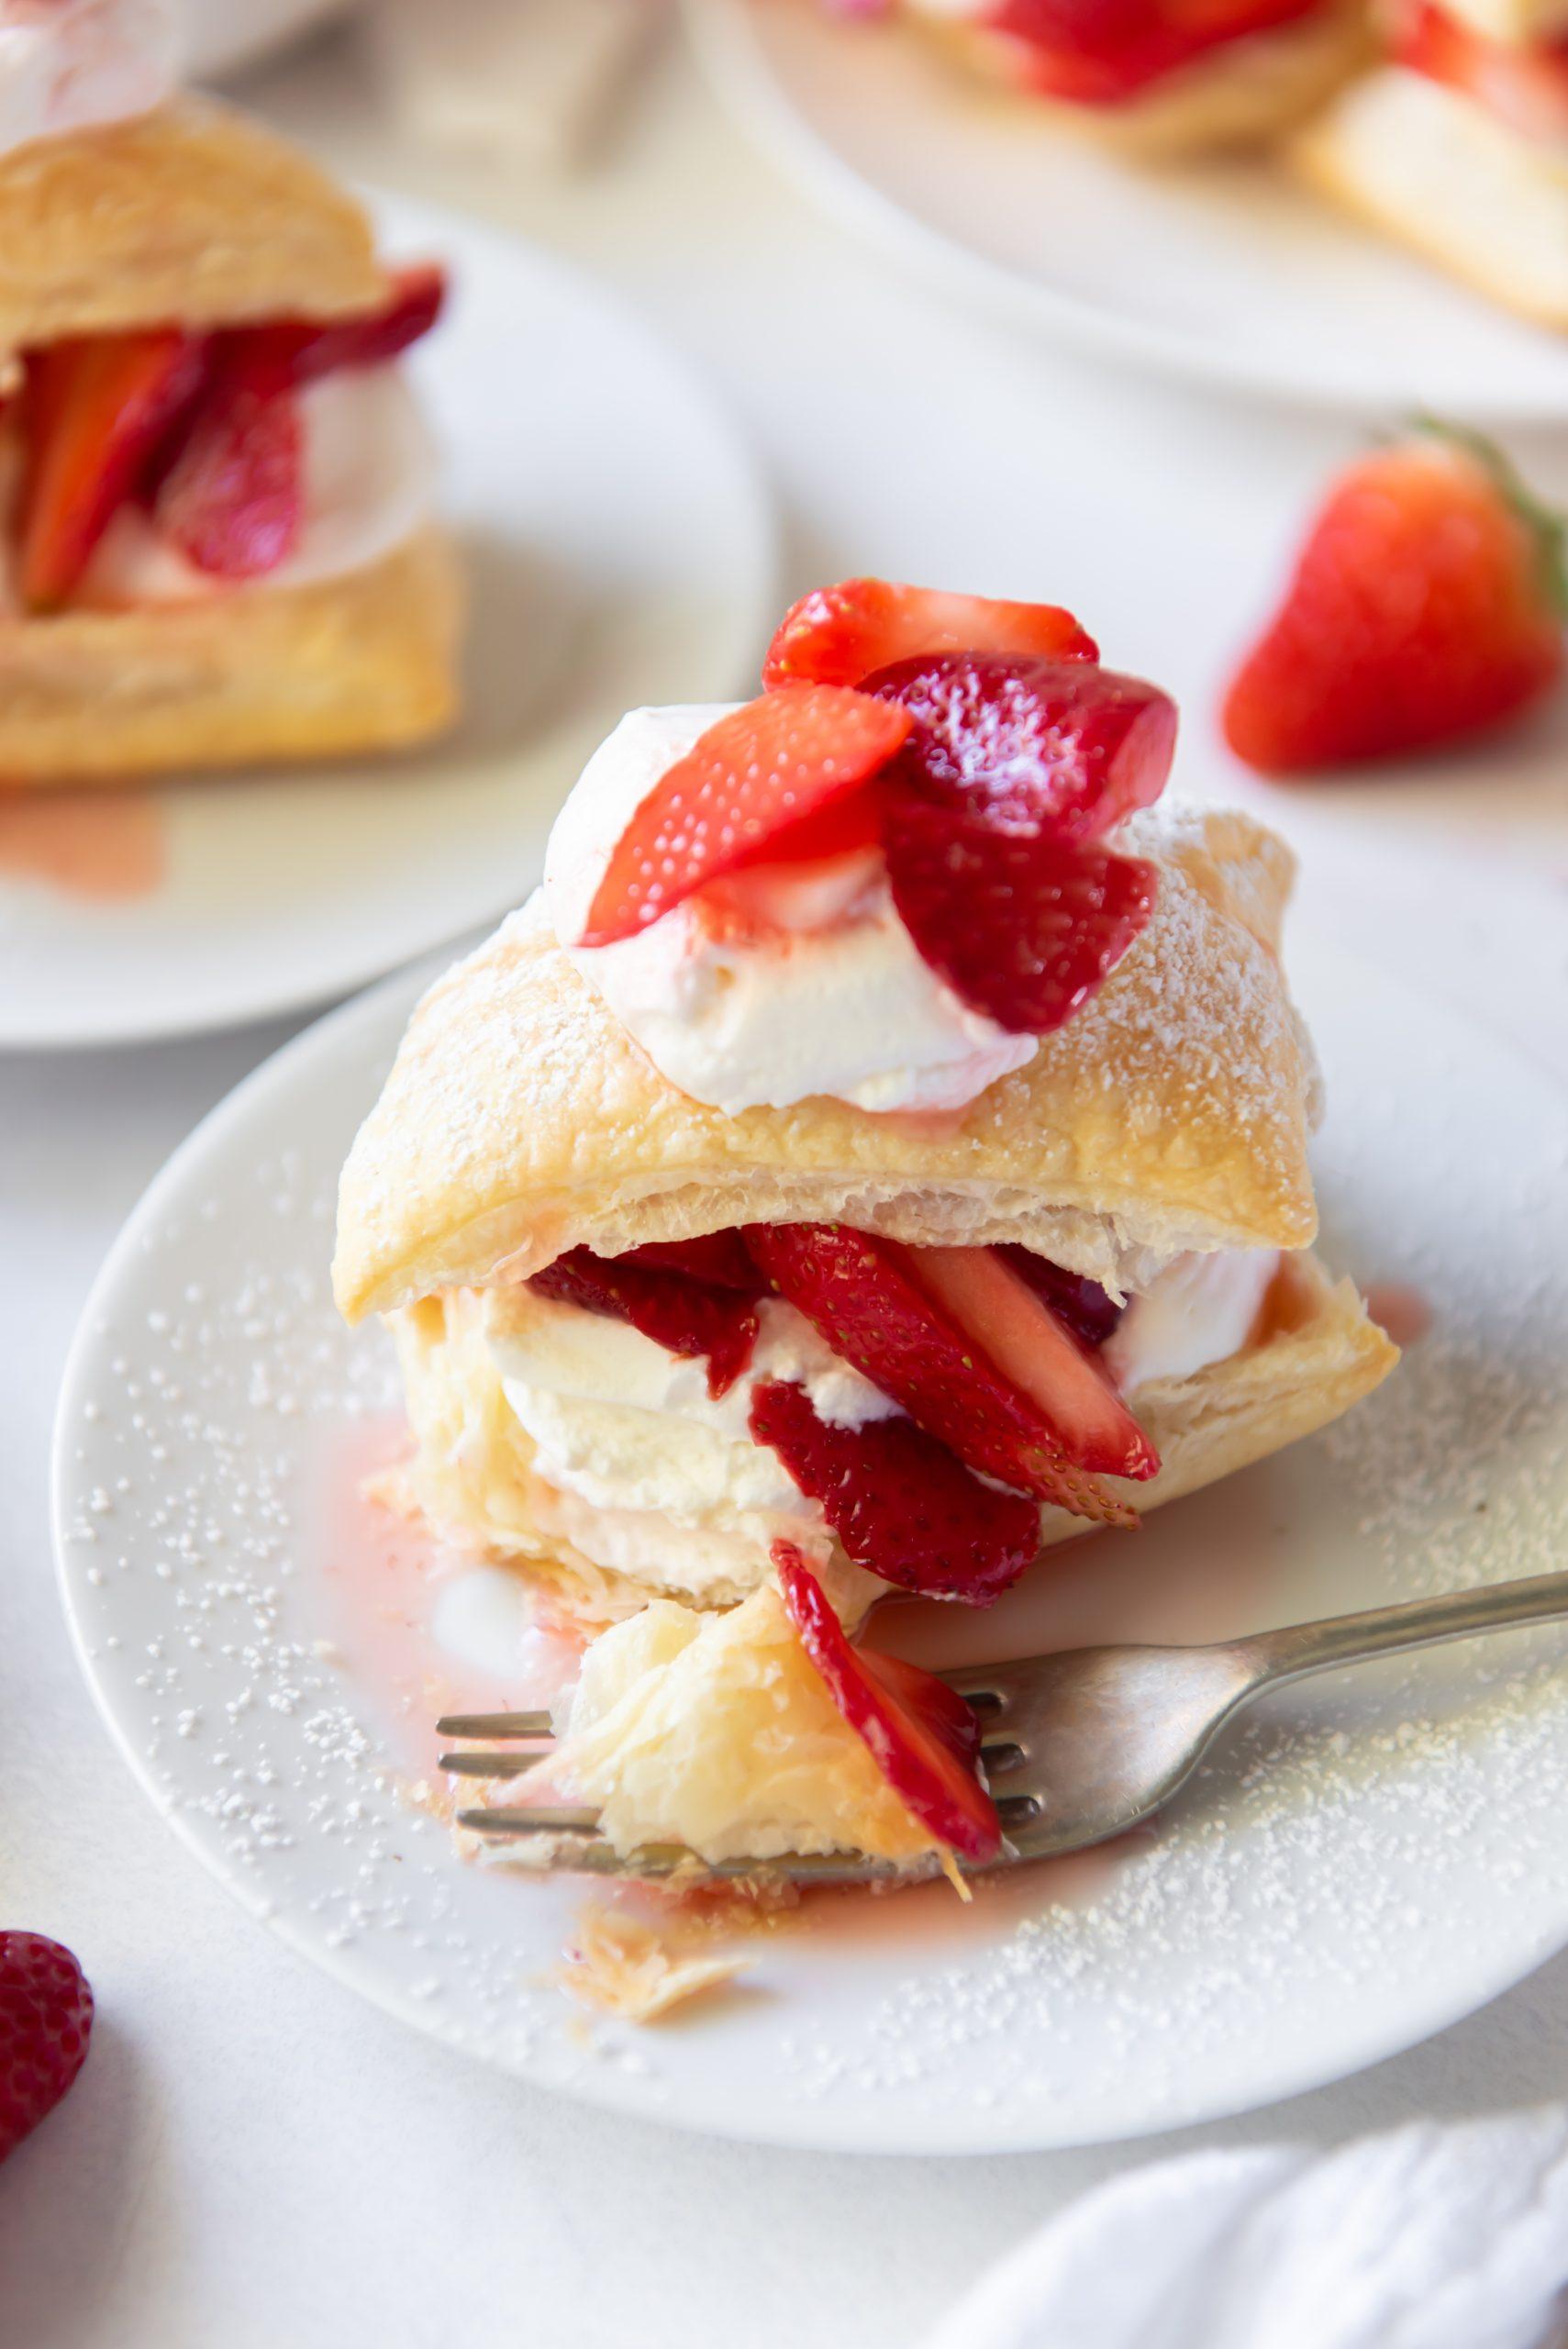 shortcake on a white plate